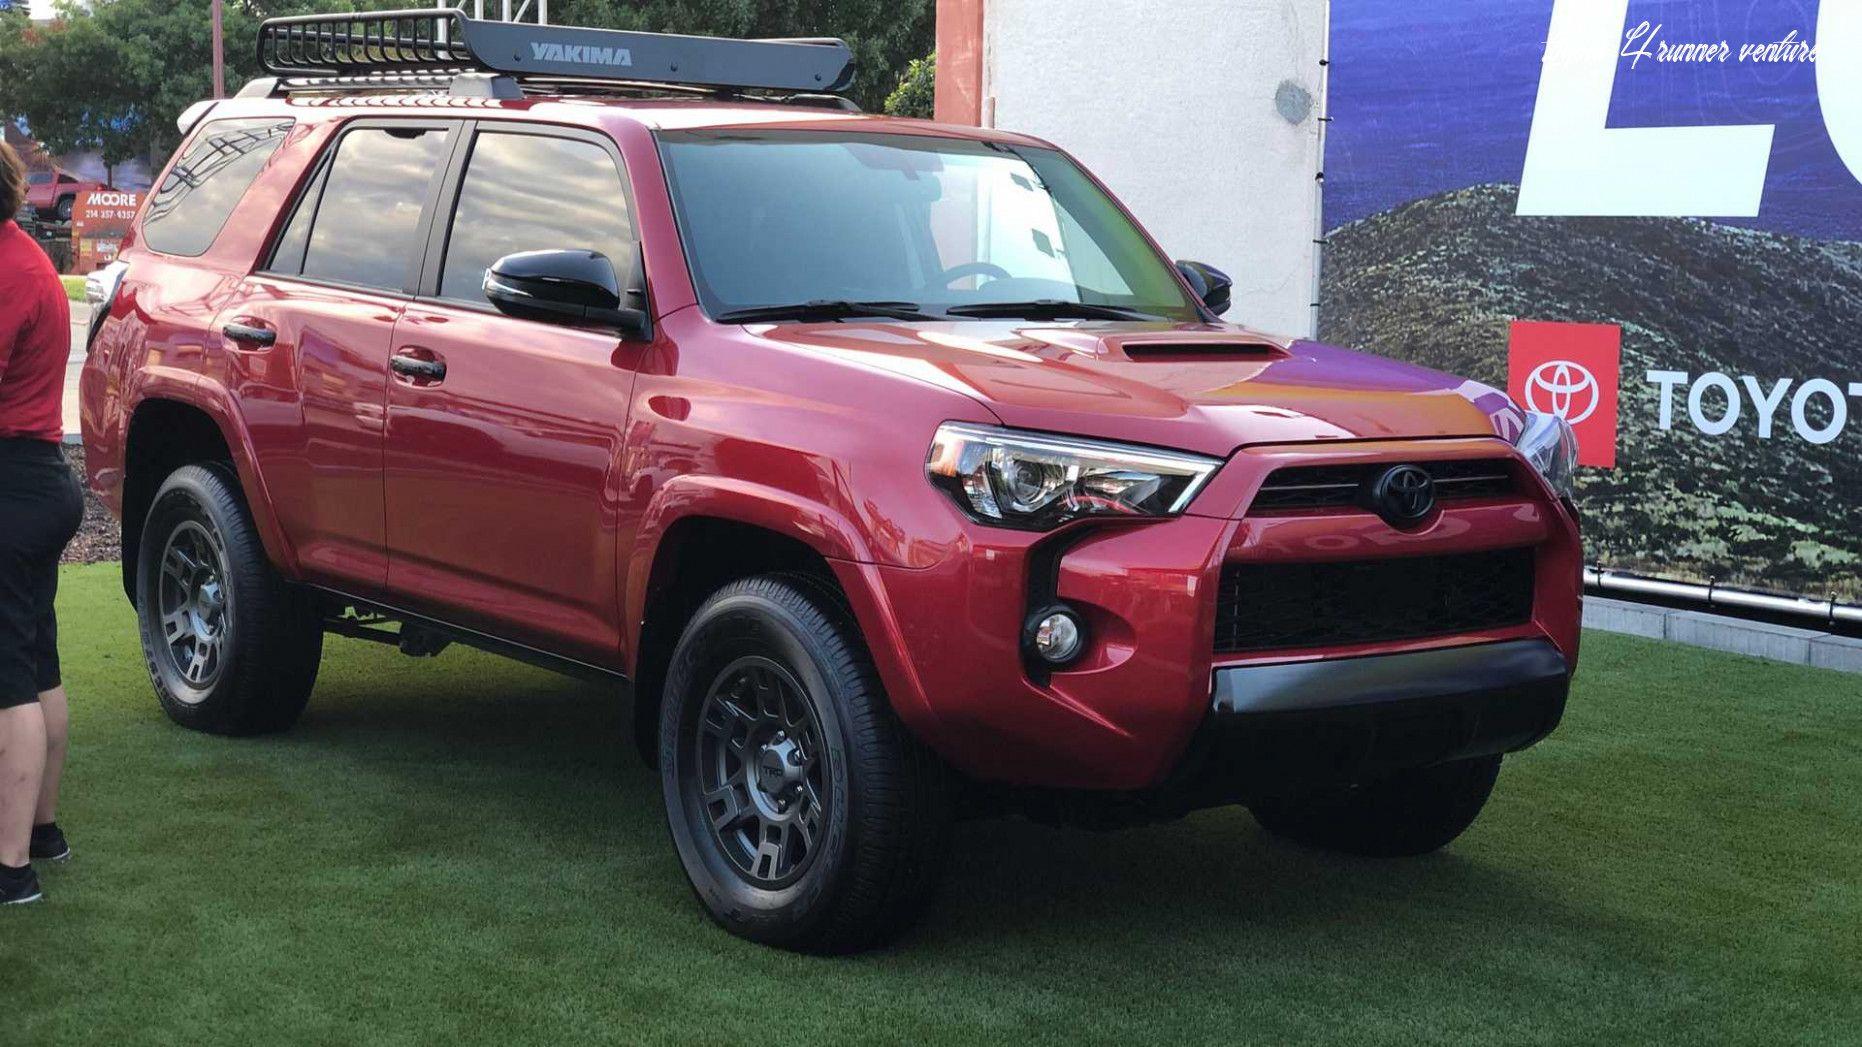 Toyota 4runner Venture Pricing In 2020 Toyota 4runner 4runner Toyota